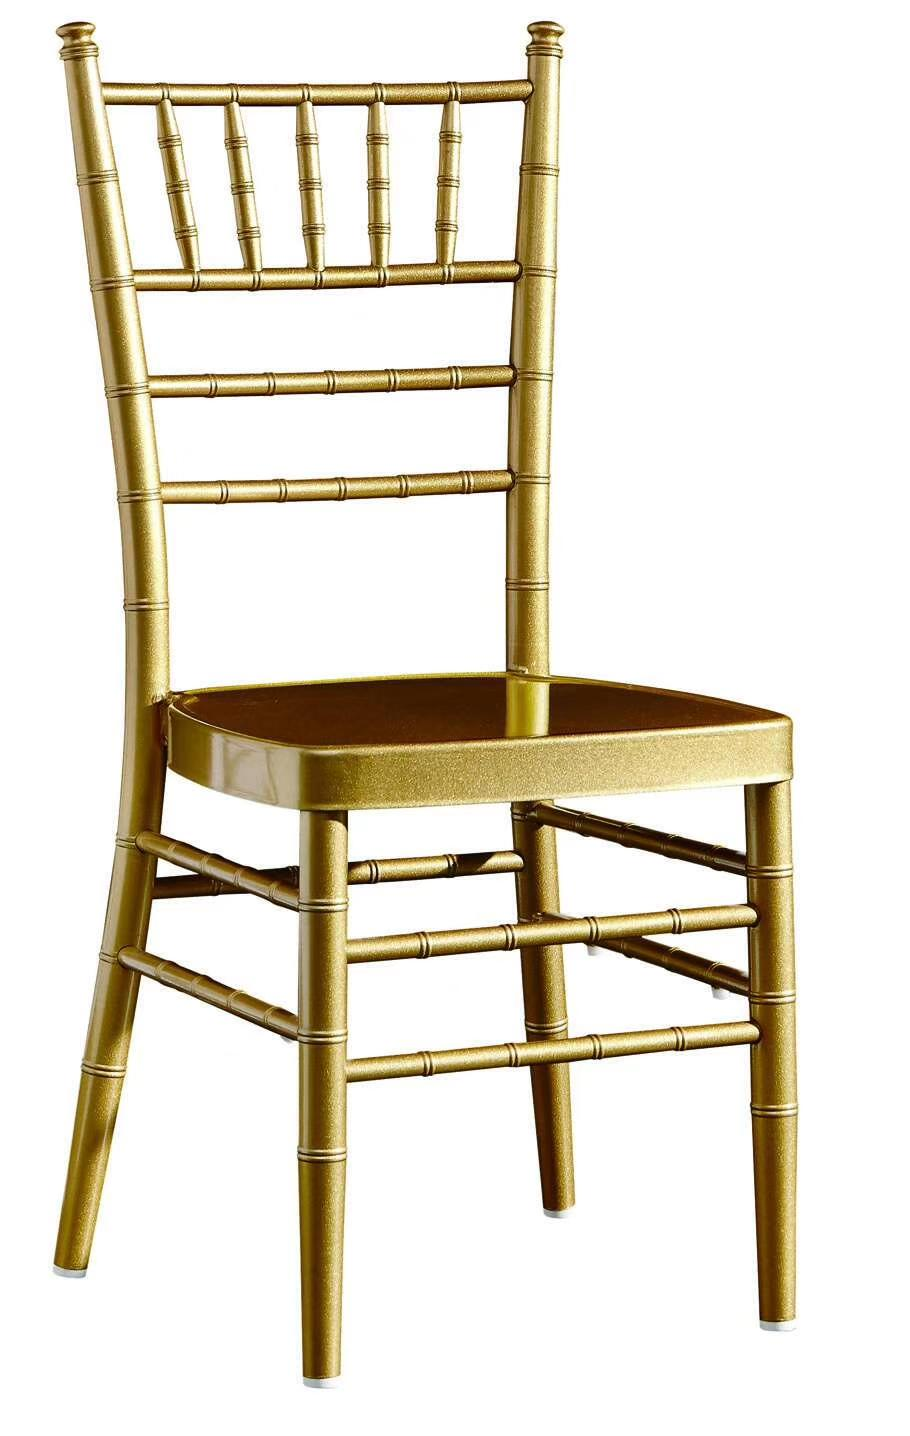 Hotel Banquet Chair Aluminum Tiffany Chair With Detachable Cushion YC-002